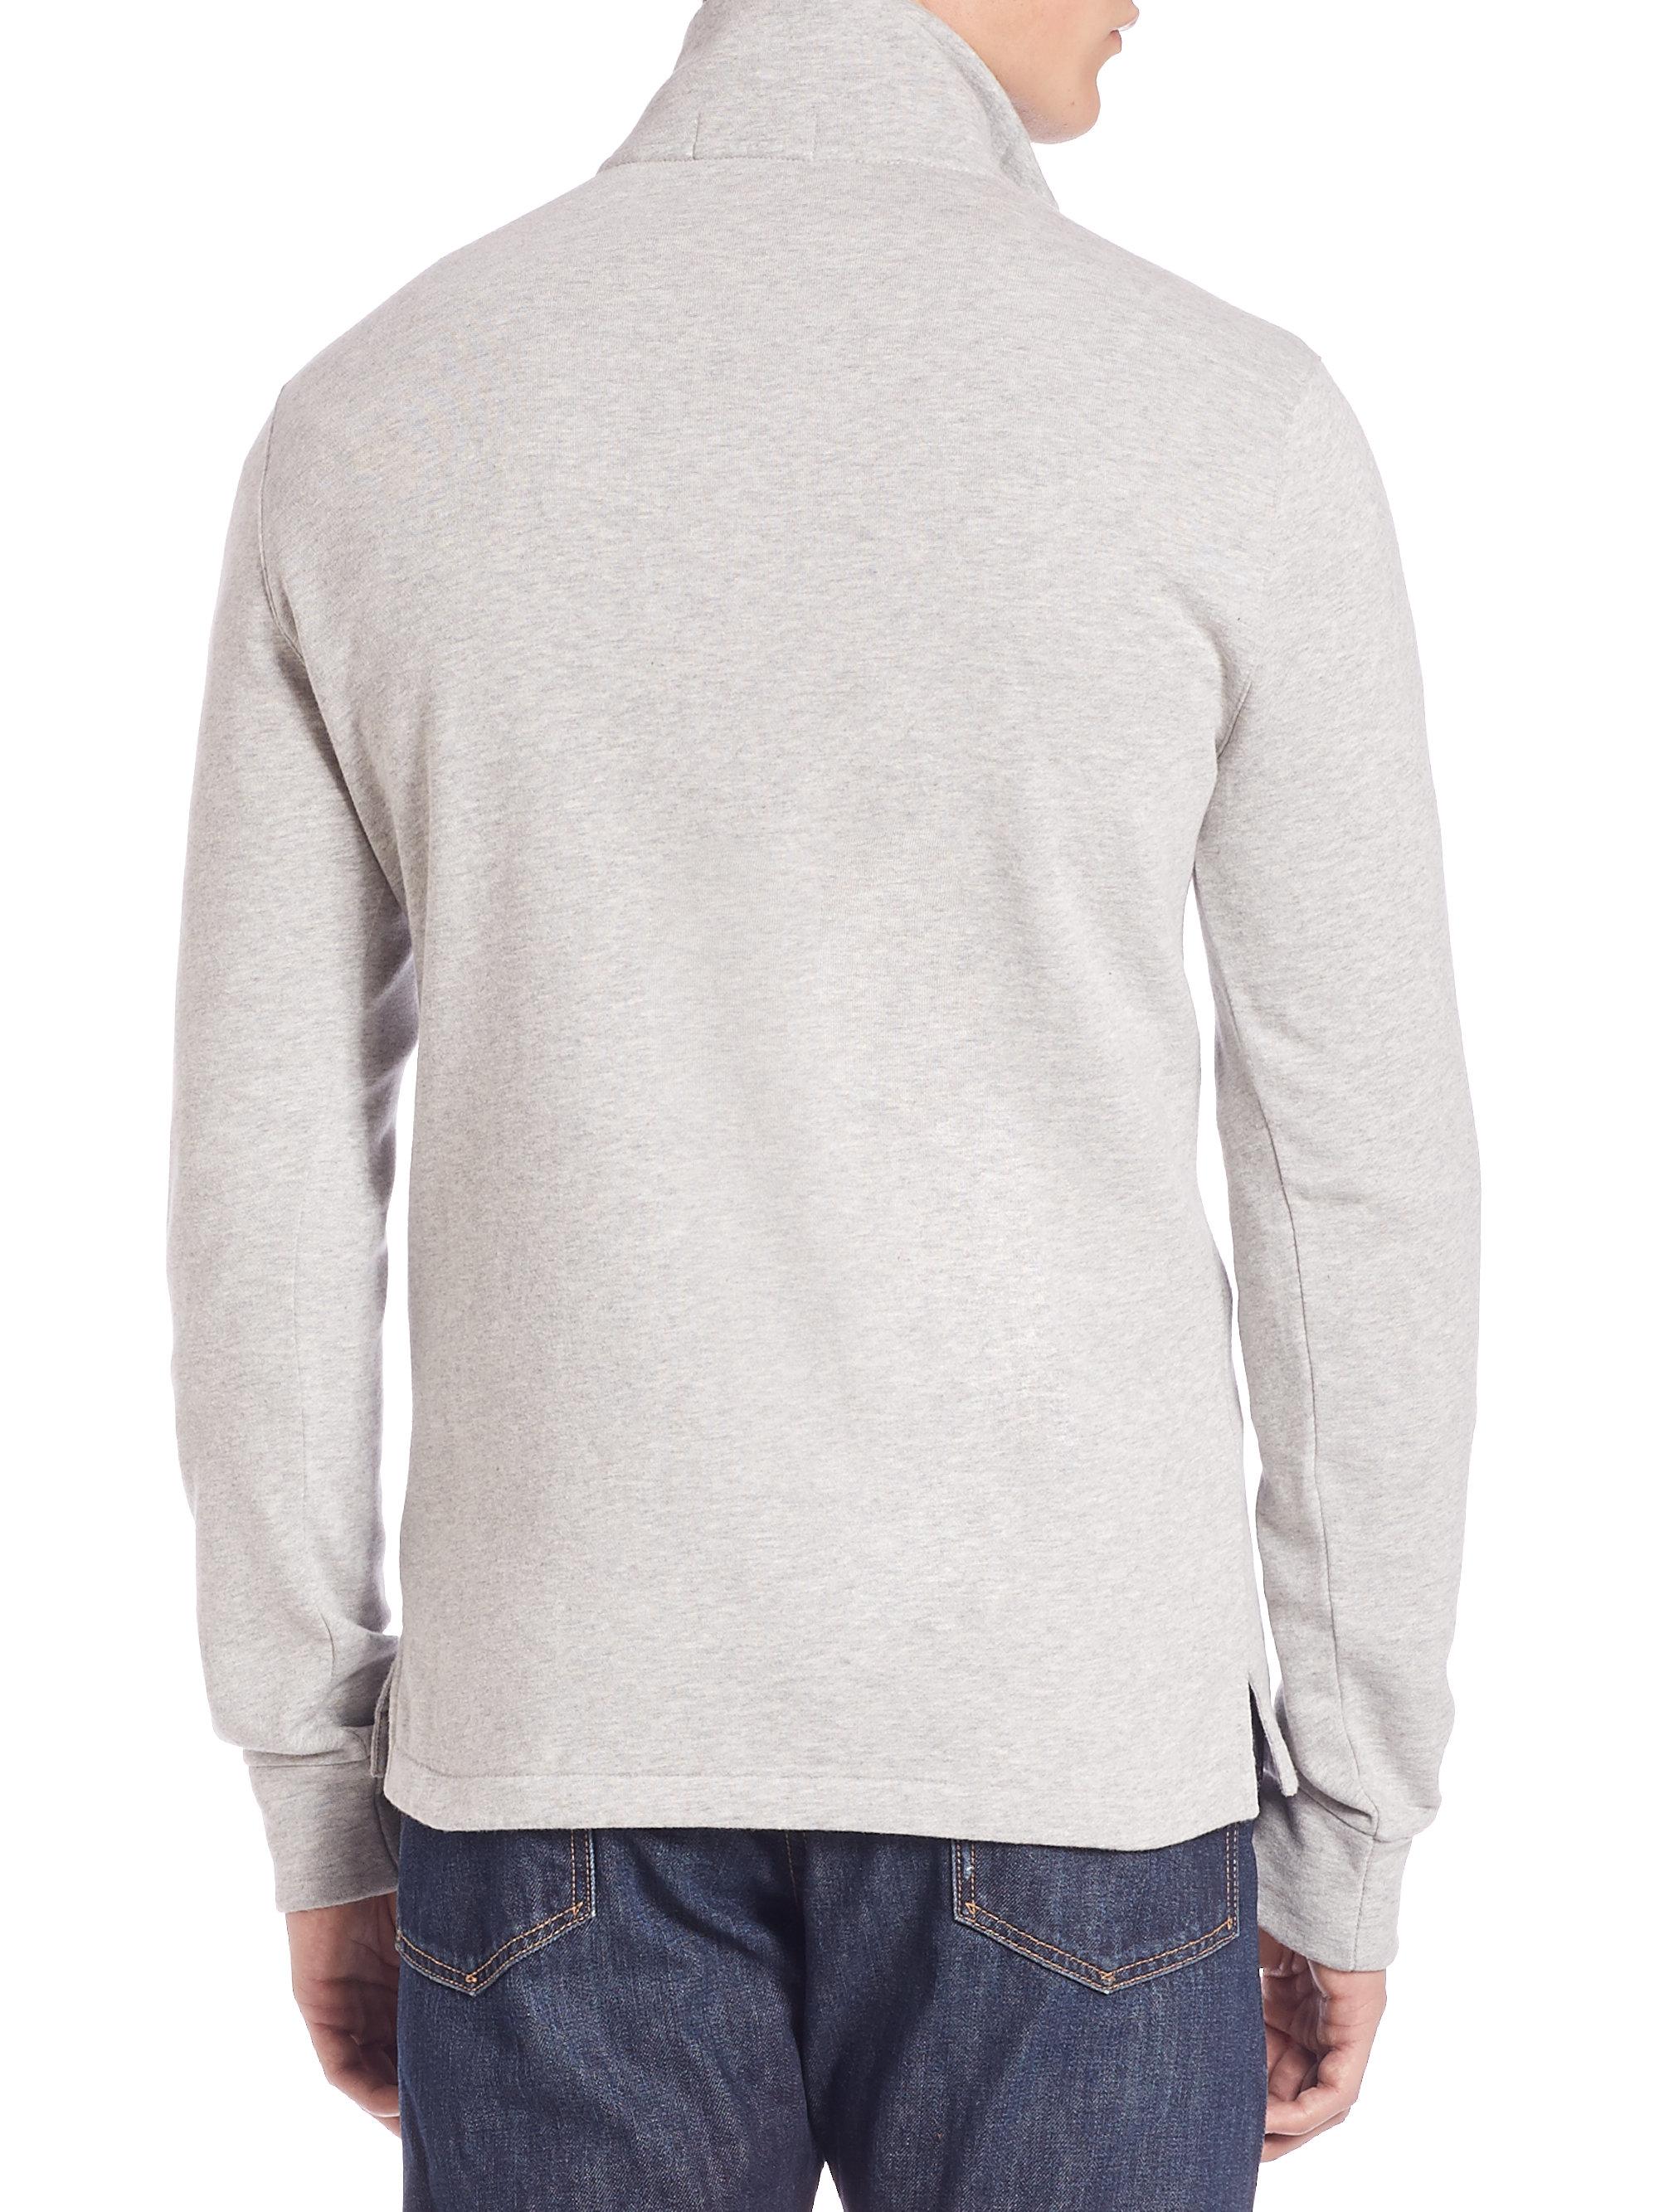 polo ralph lauren fleece mockneck pullover in gray for men. Black Bedroom Furniture Sets. Home Design Ideas